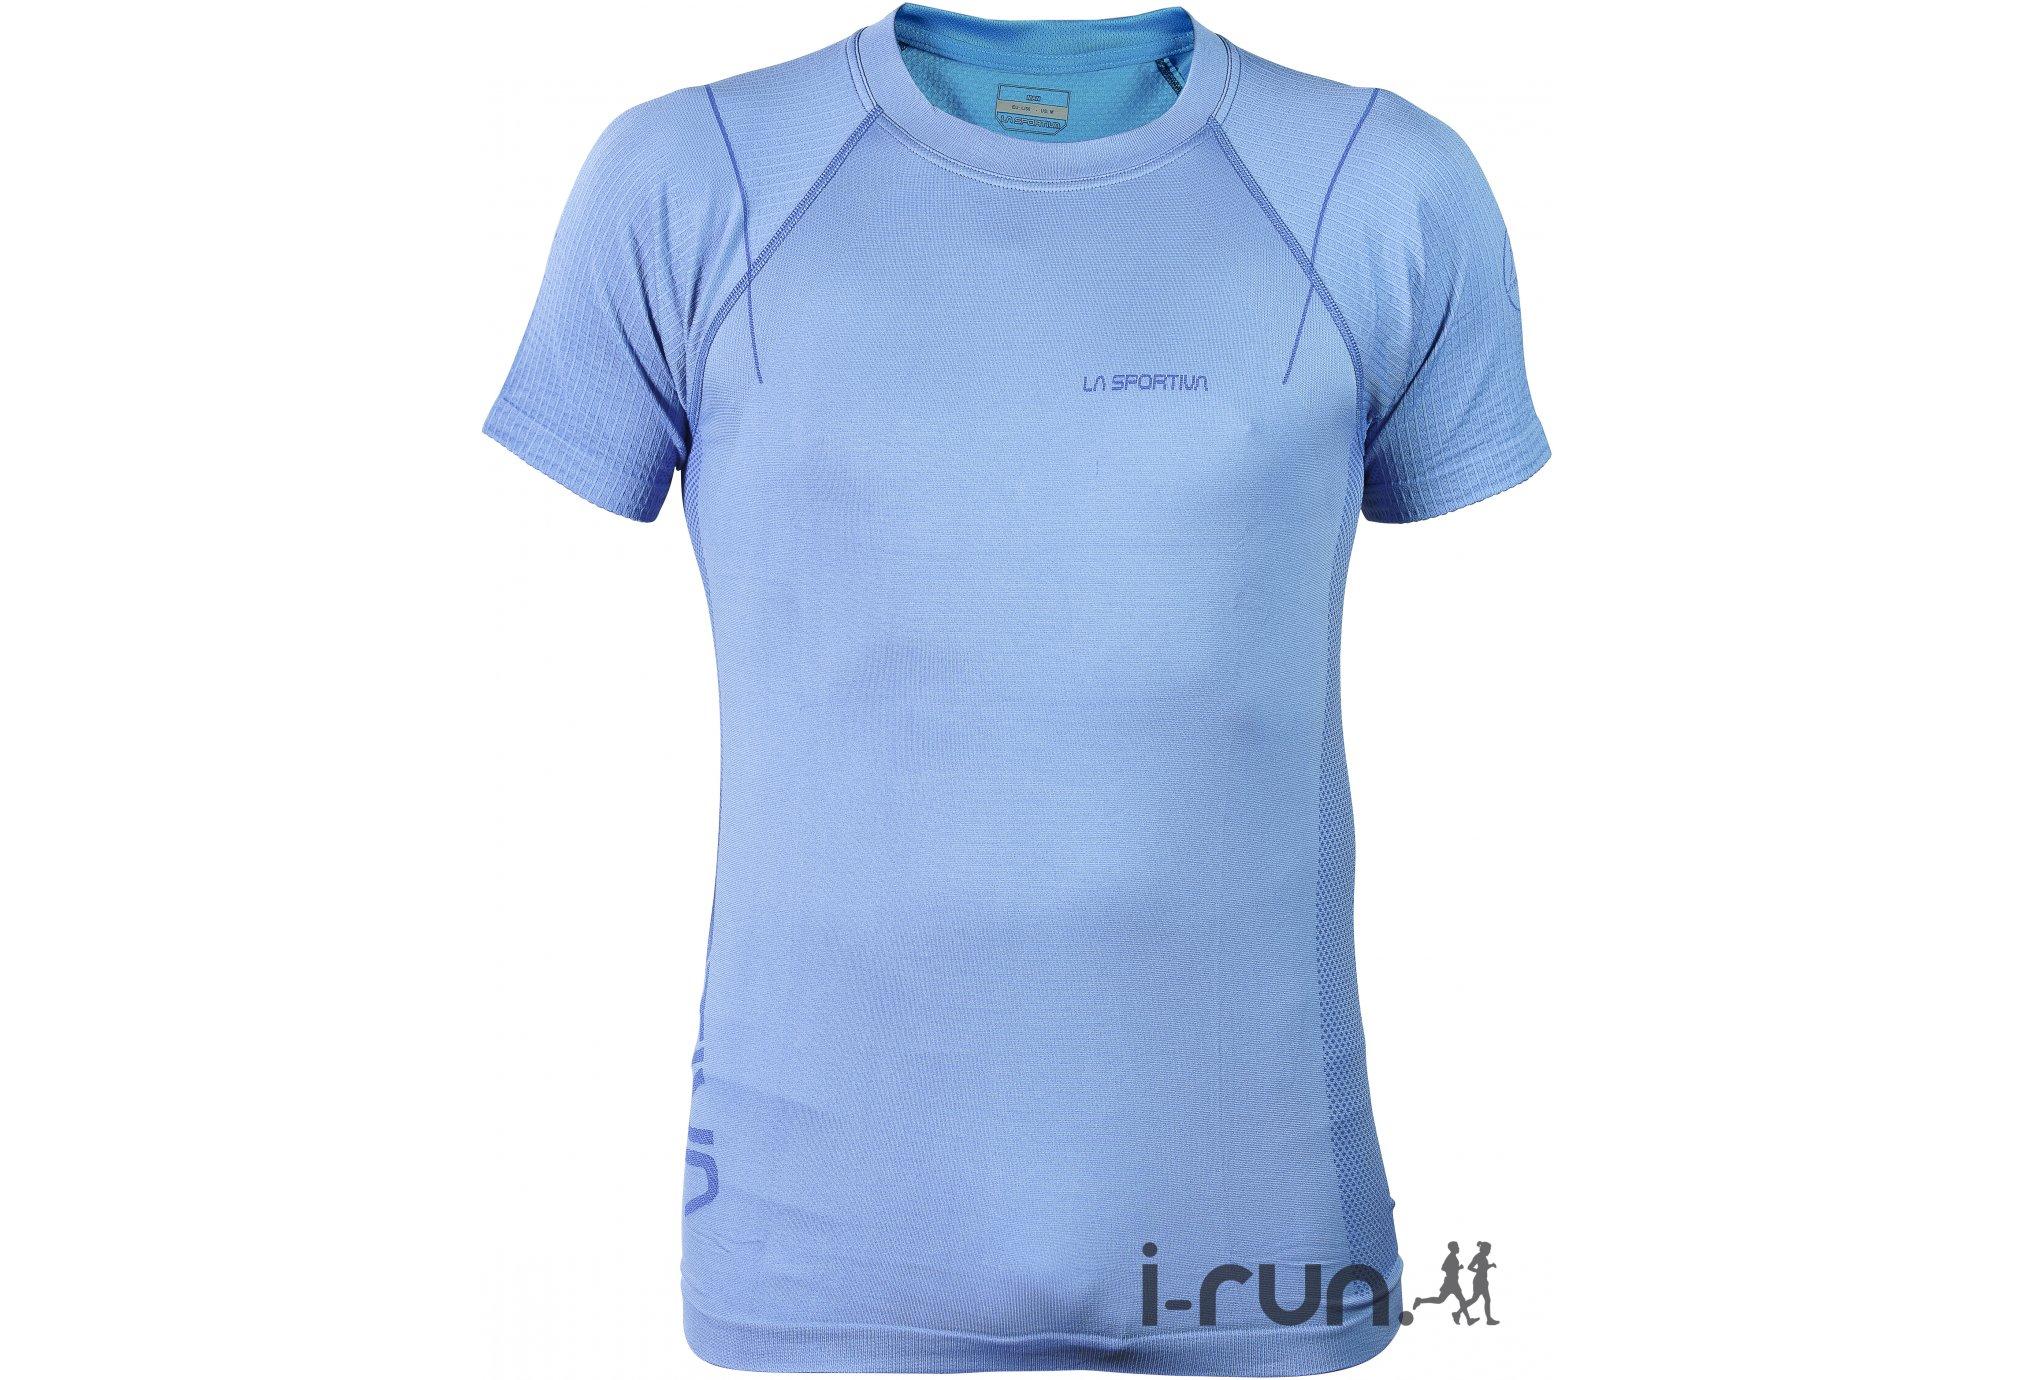 La Sportiva Tee-shirt Kuma 2.0 M Diététique Vêtements homme